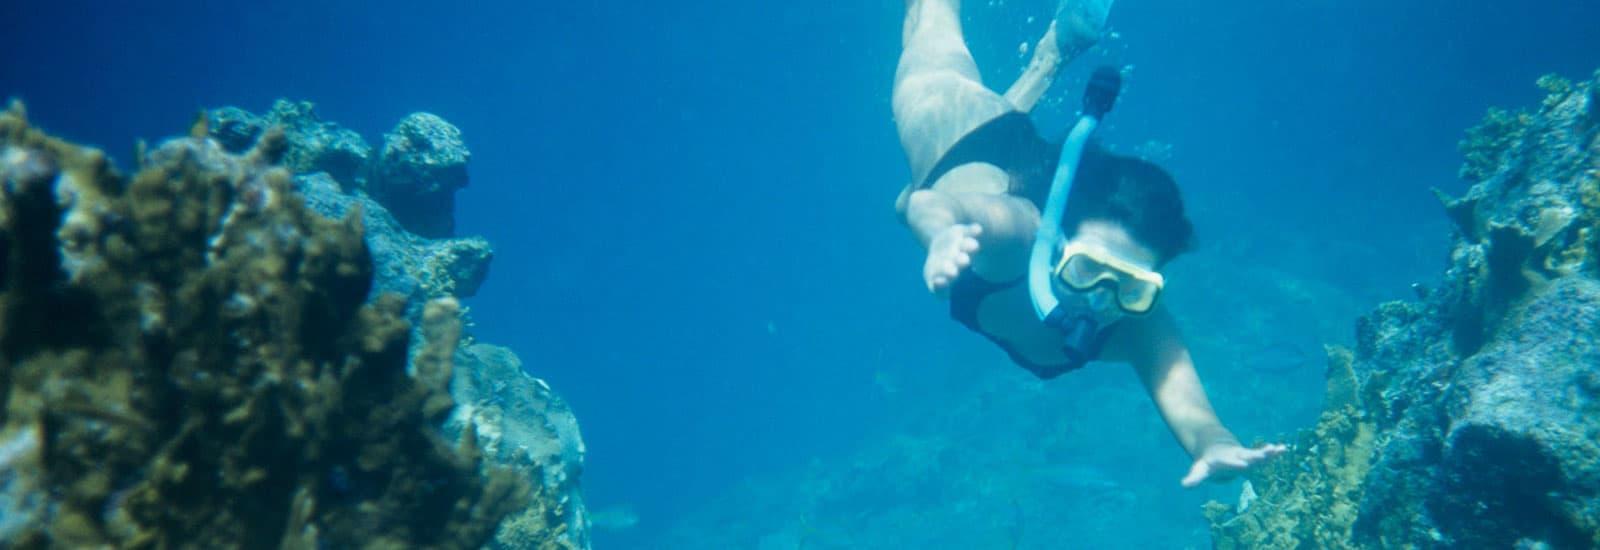 Snorkeling at Cabo Pulmo of Mexico